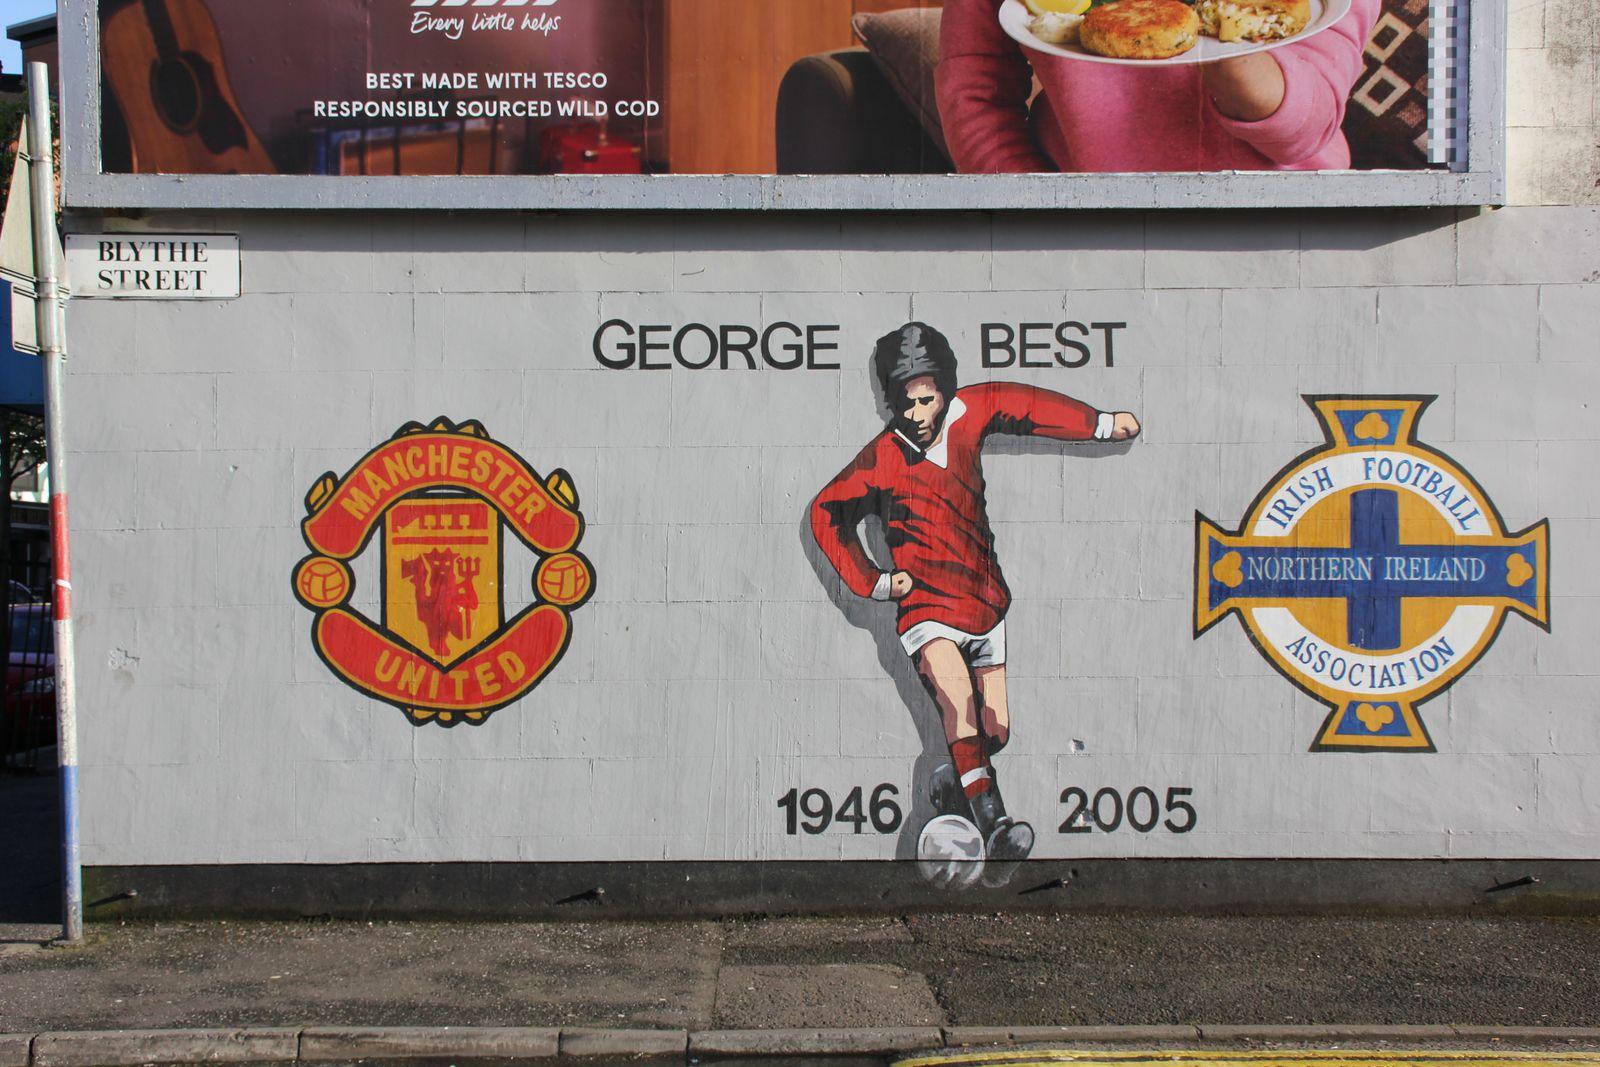 785) Sandy Row, South Belfast